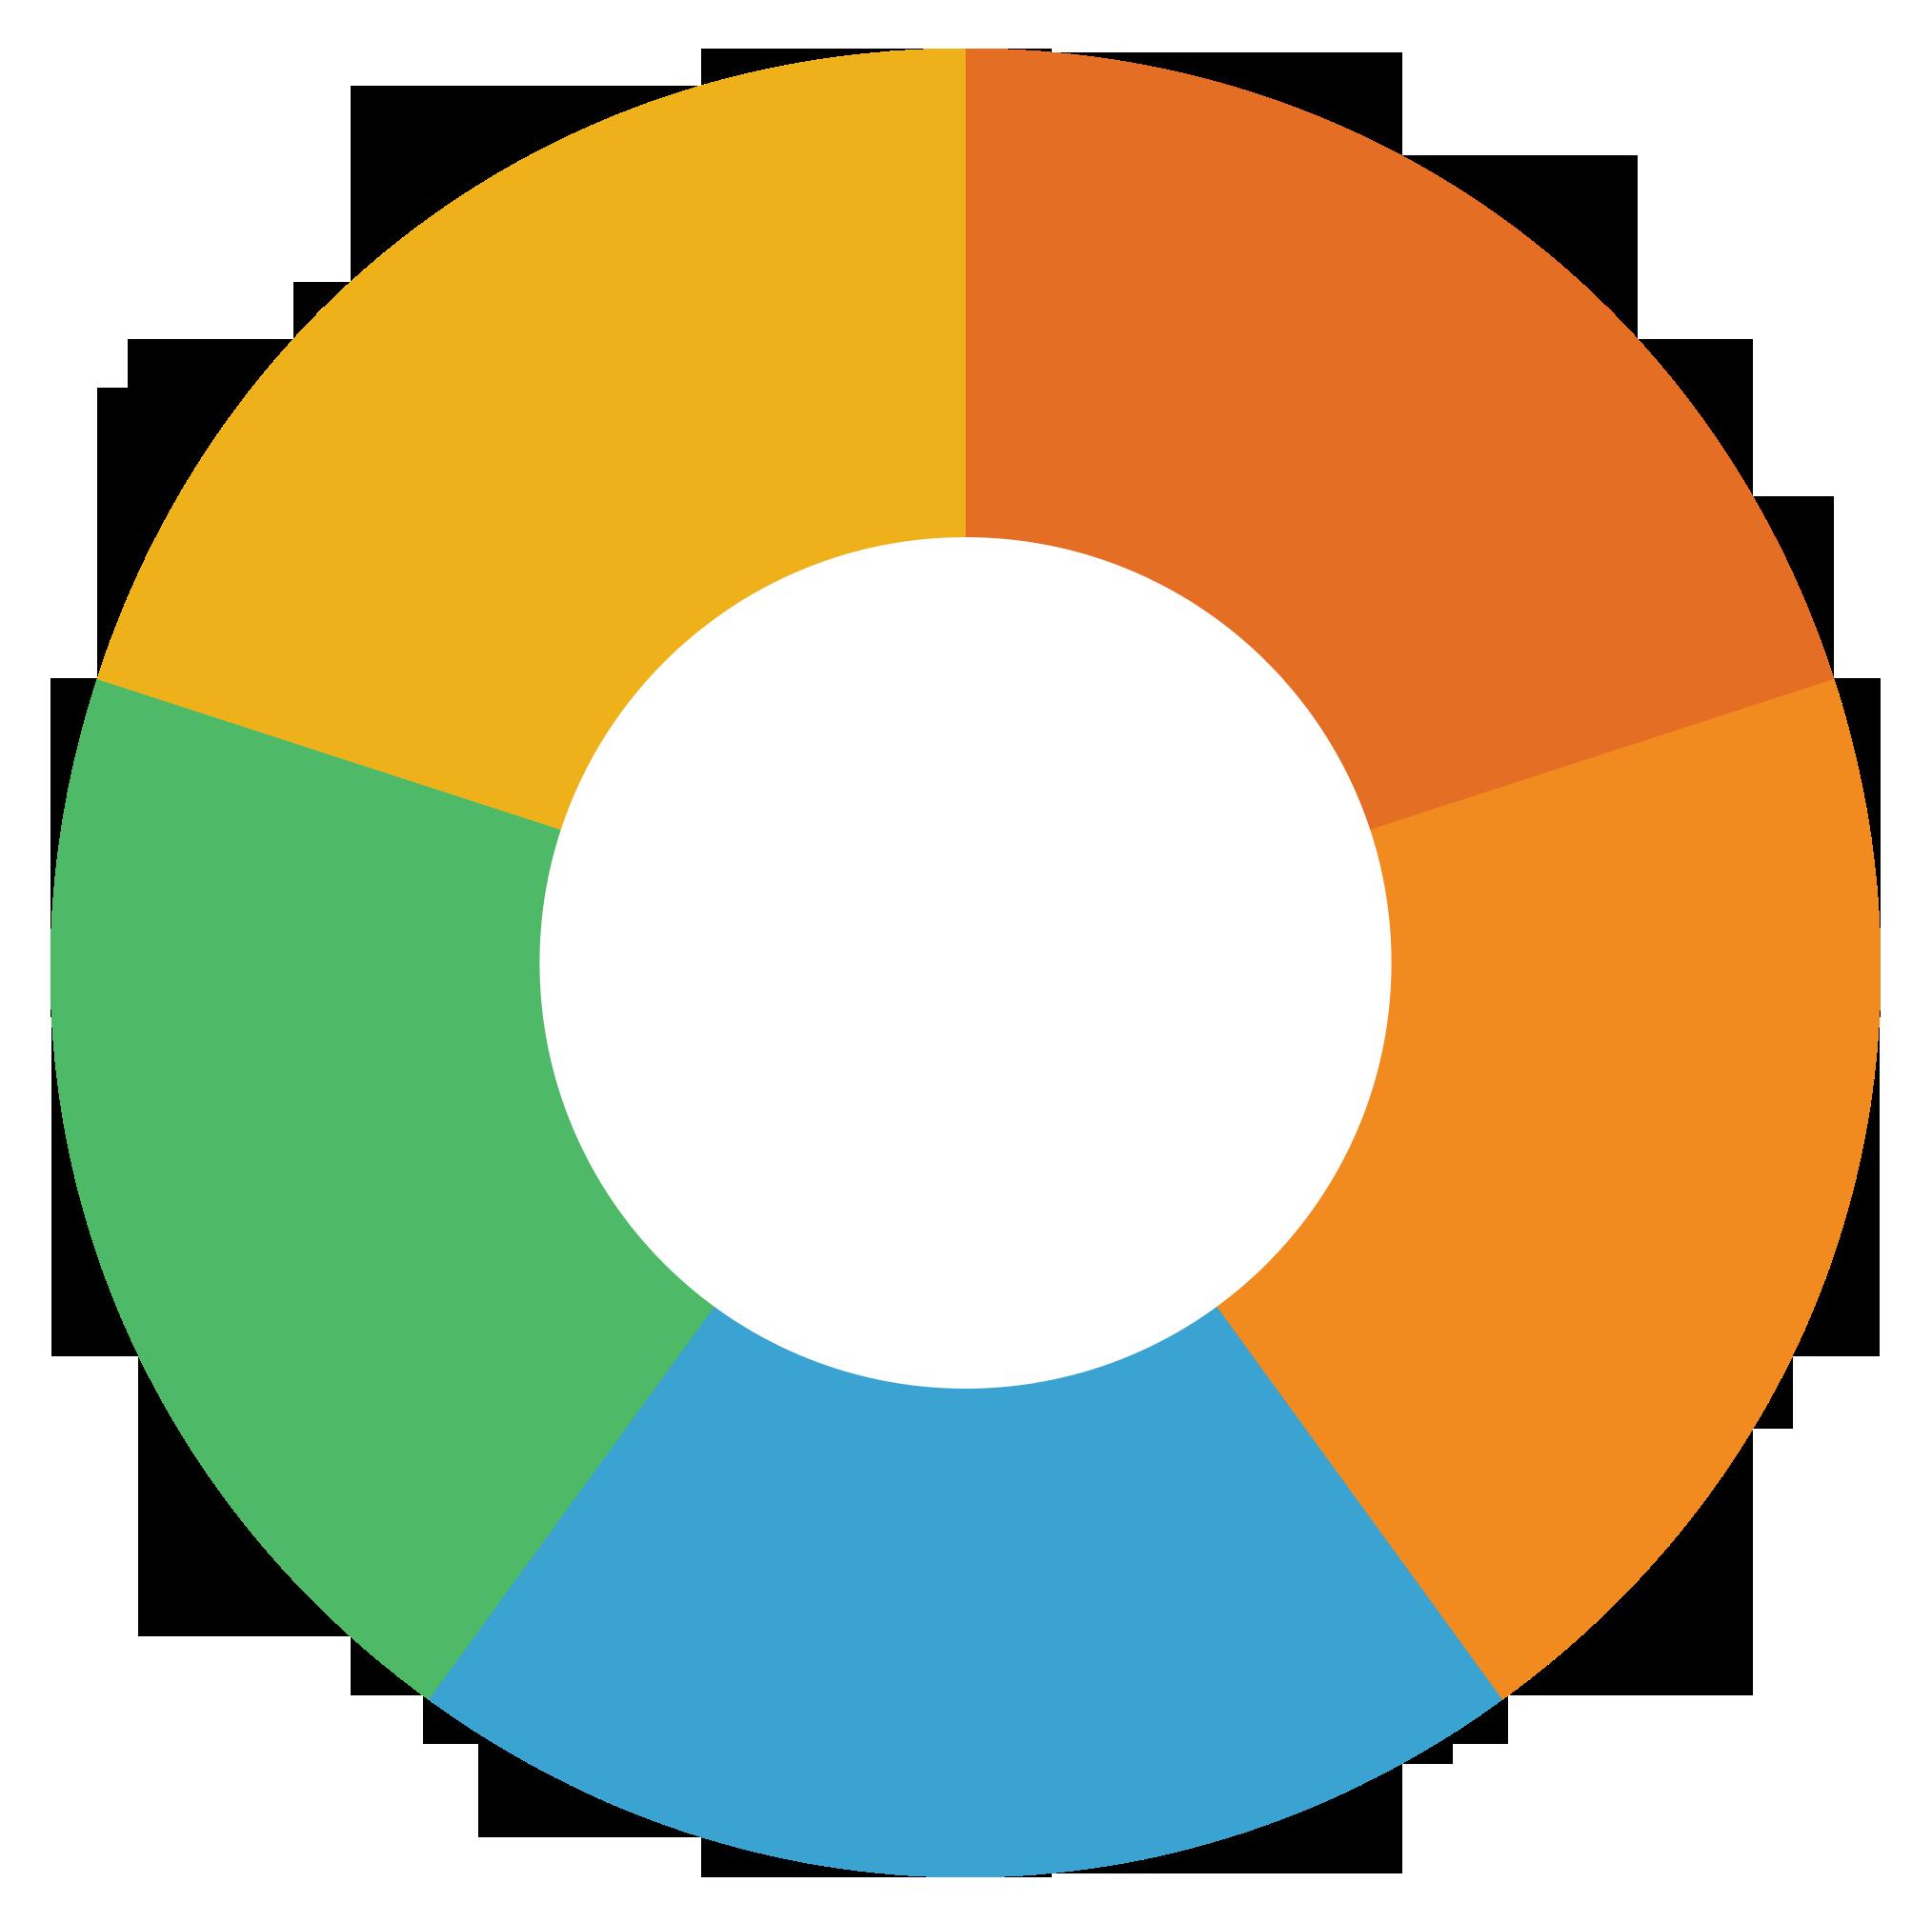 PNG Pie Chart Transparent Pie Chart.PNG Images..